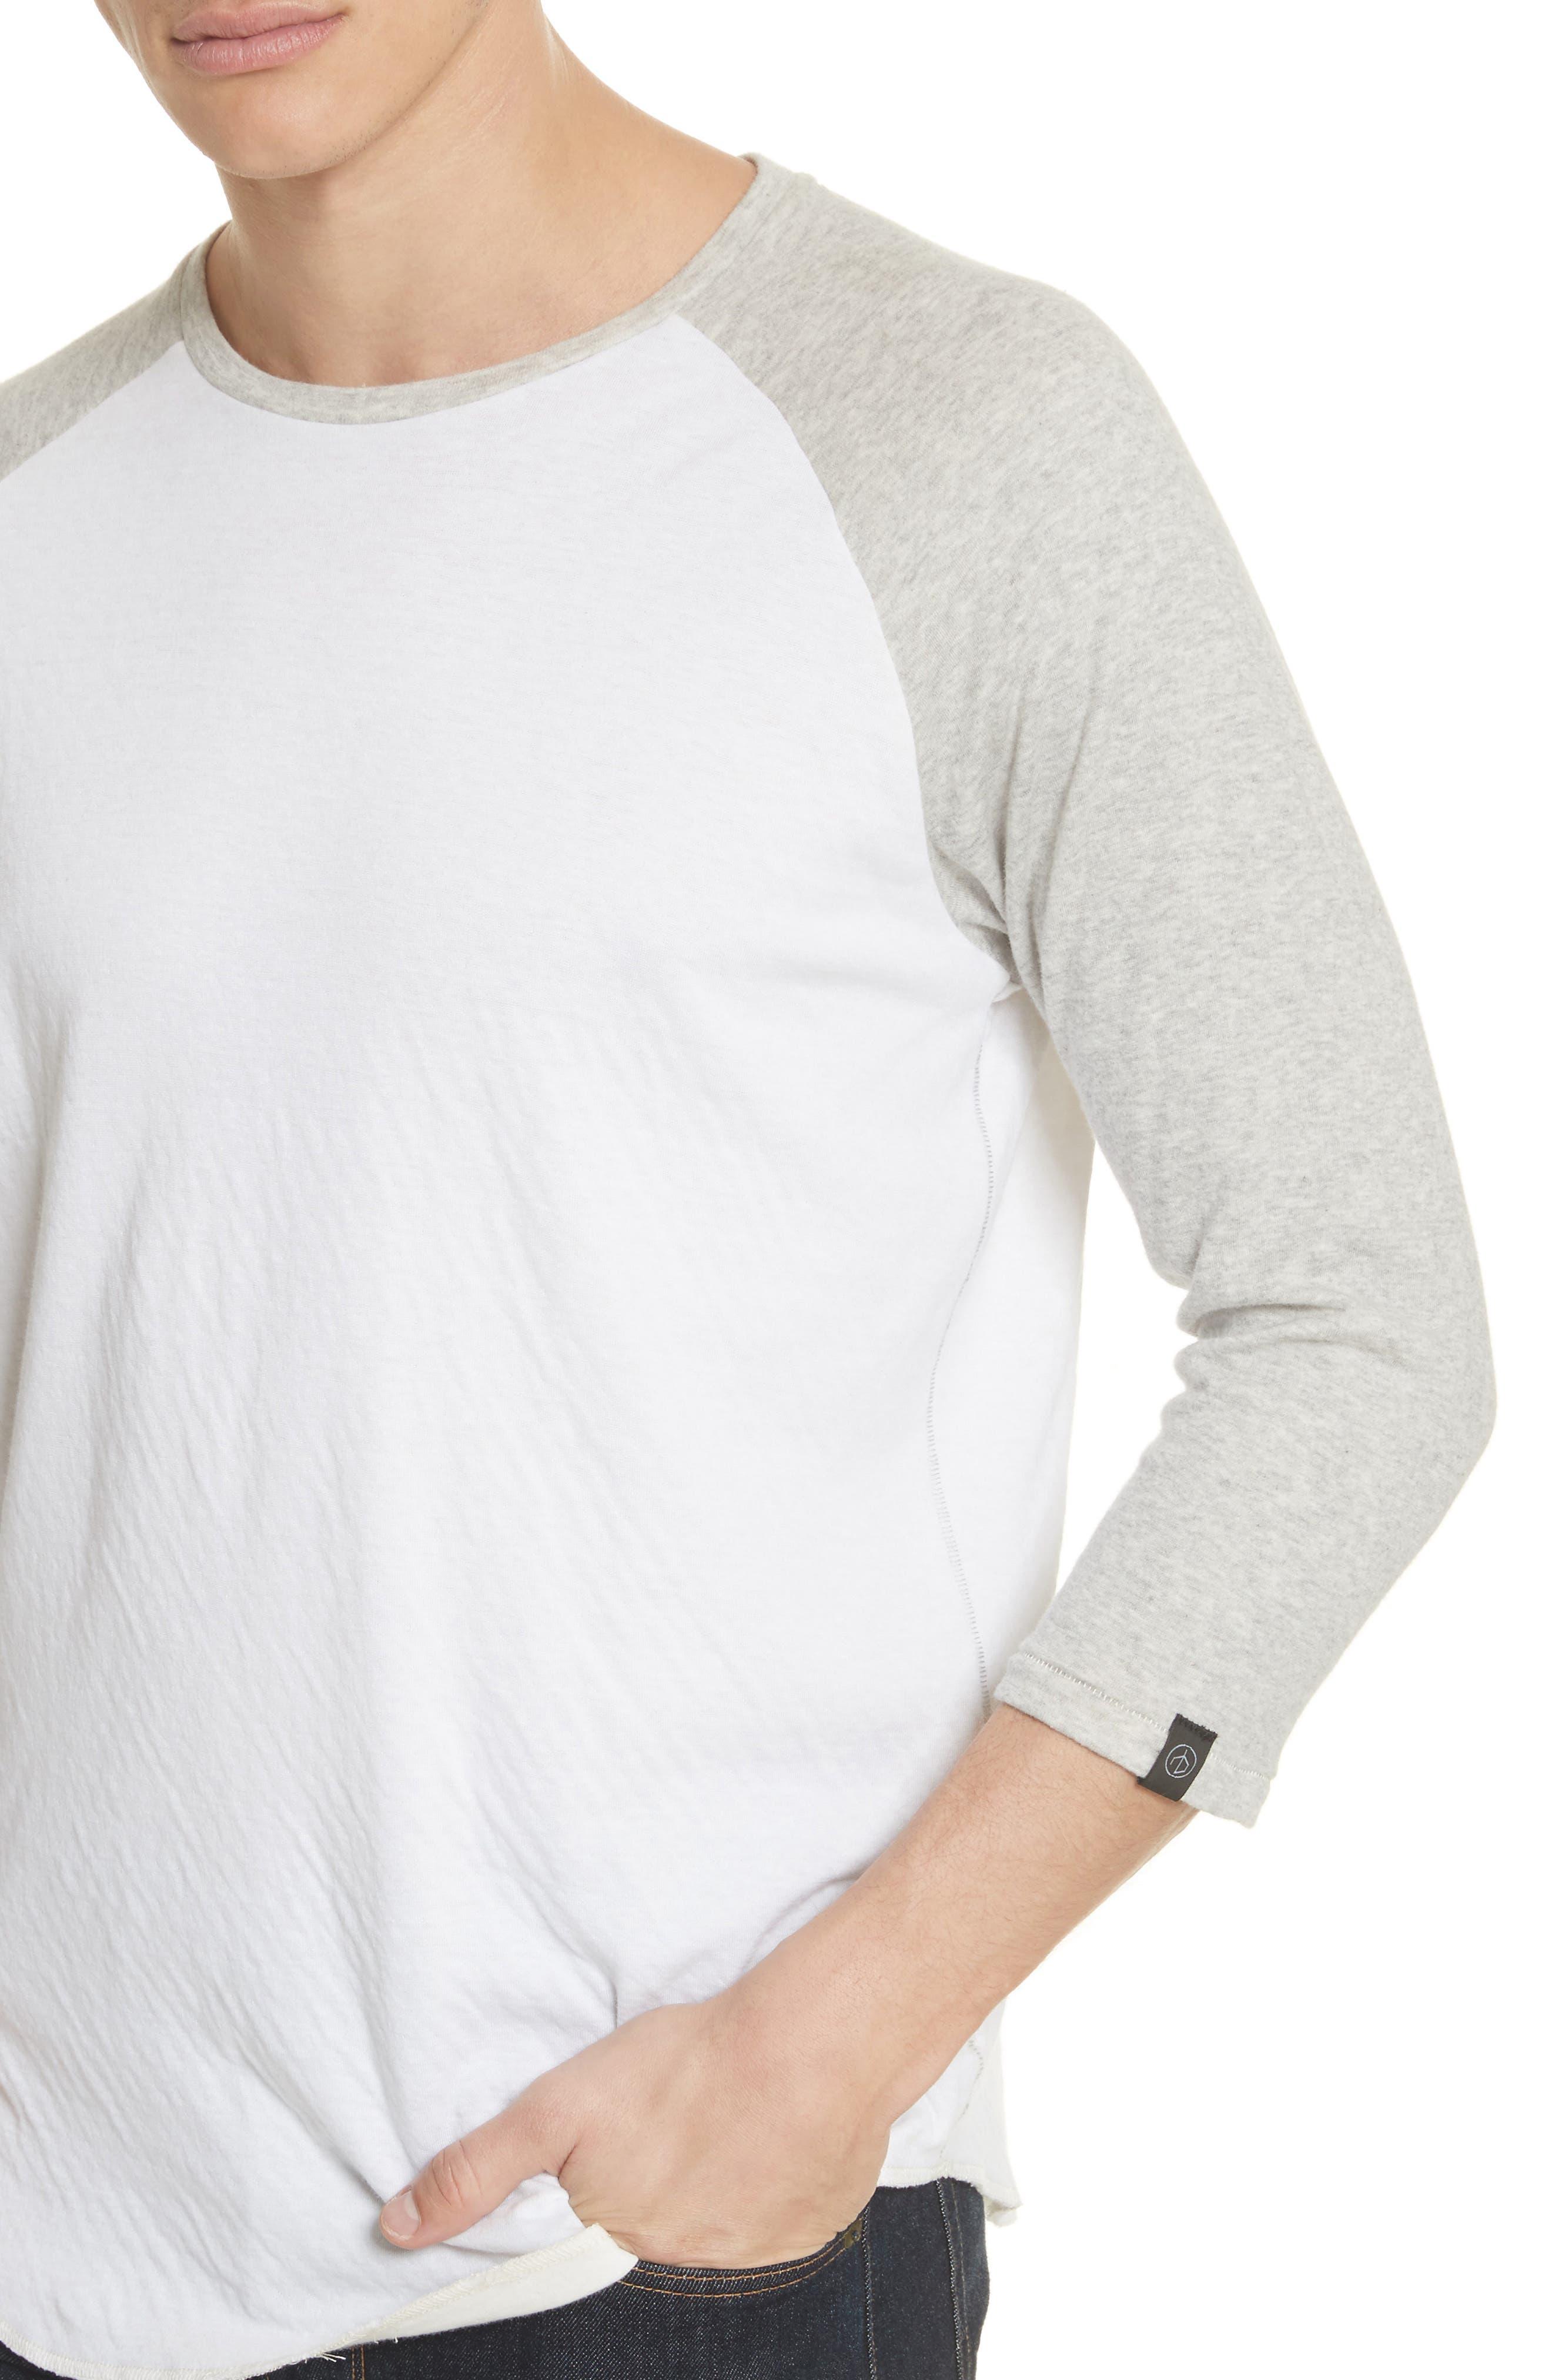 Rigby Baseball T-Shirt,                             Alternate thumbnail 4, color,                             068